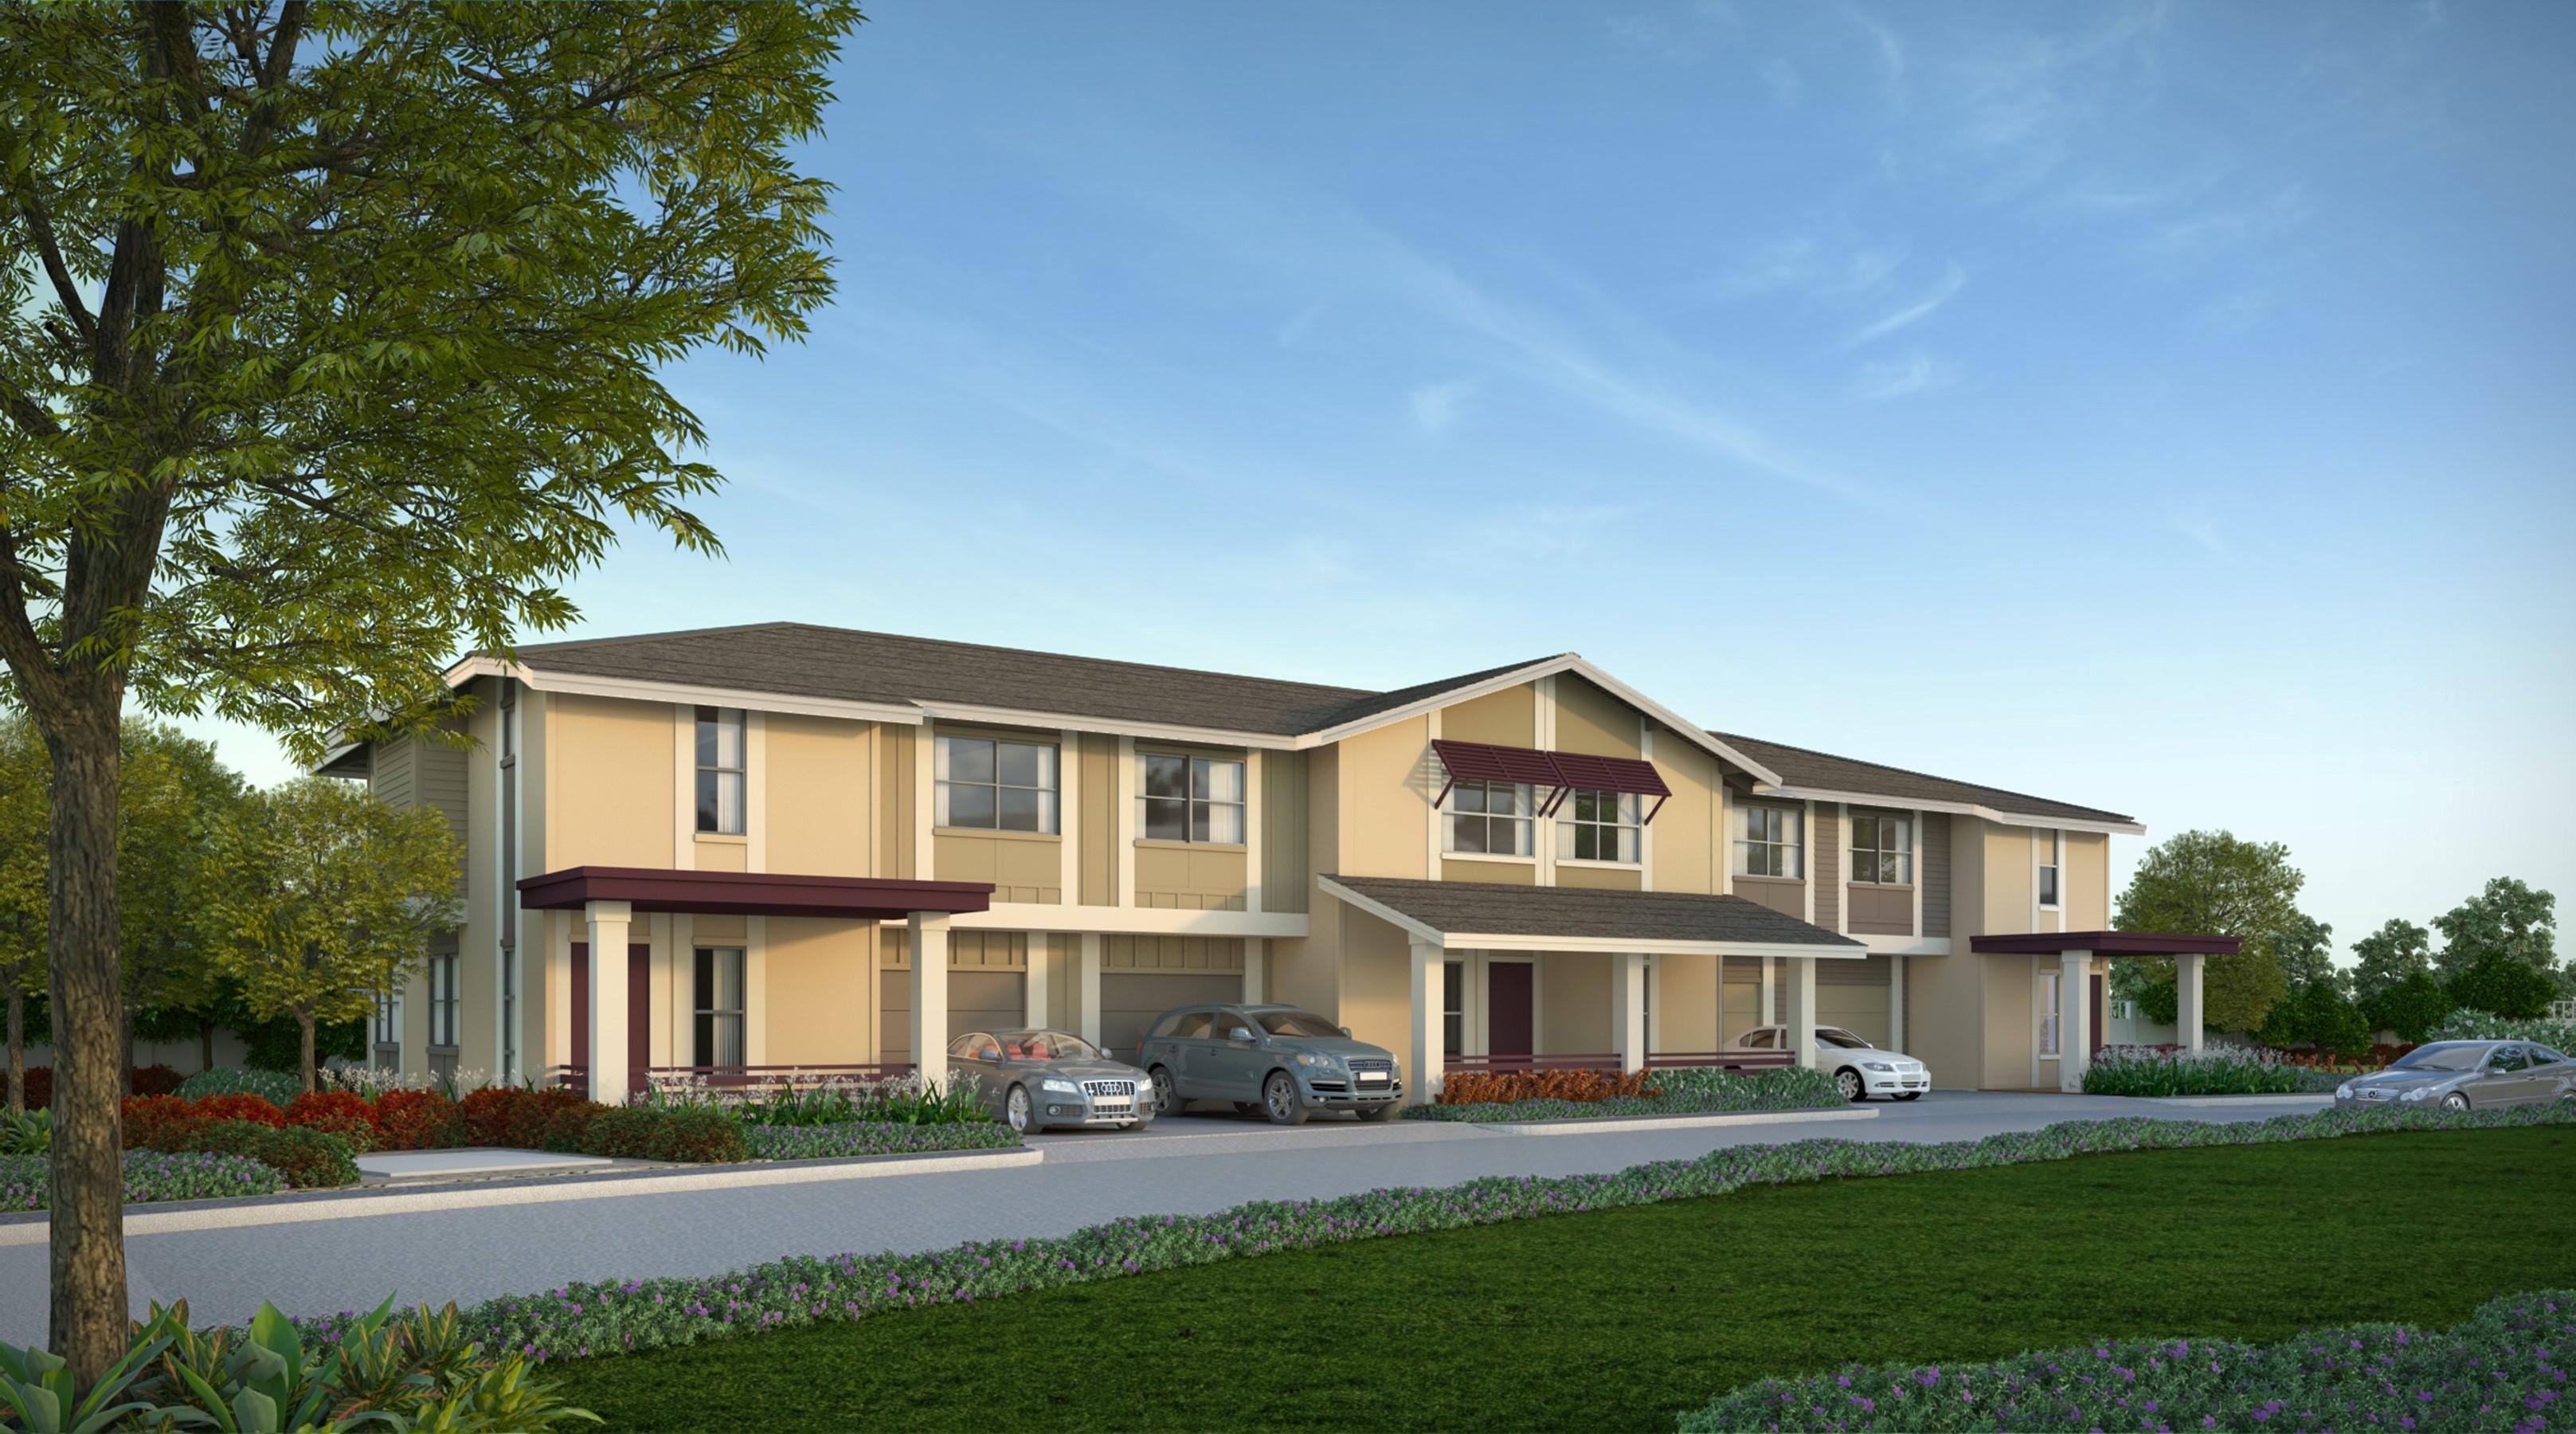 Townhomes at Kamalani. Project rendering. Courtesy image.